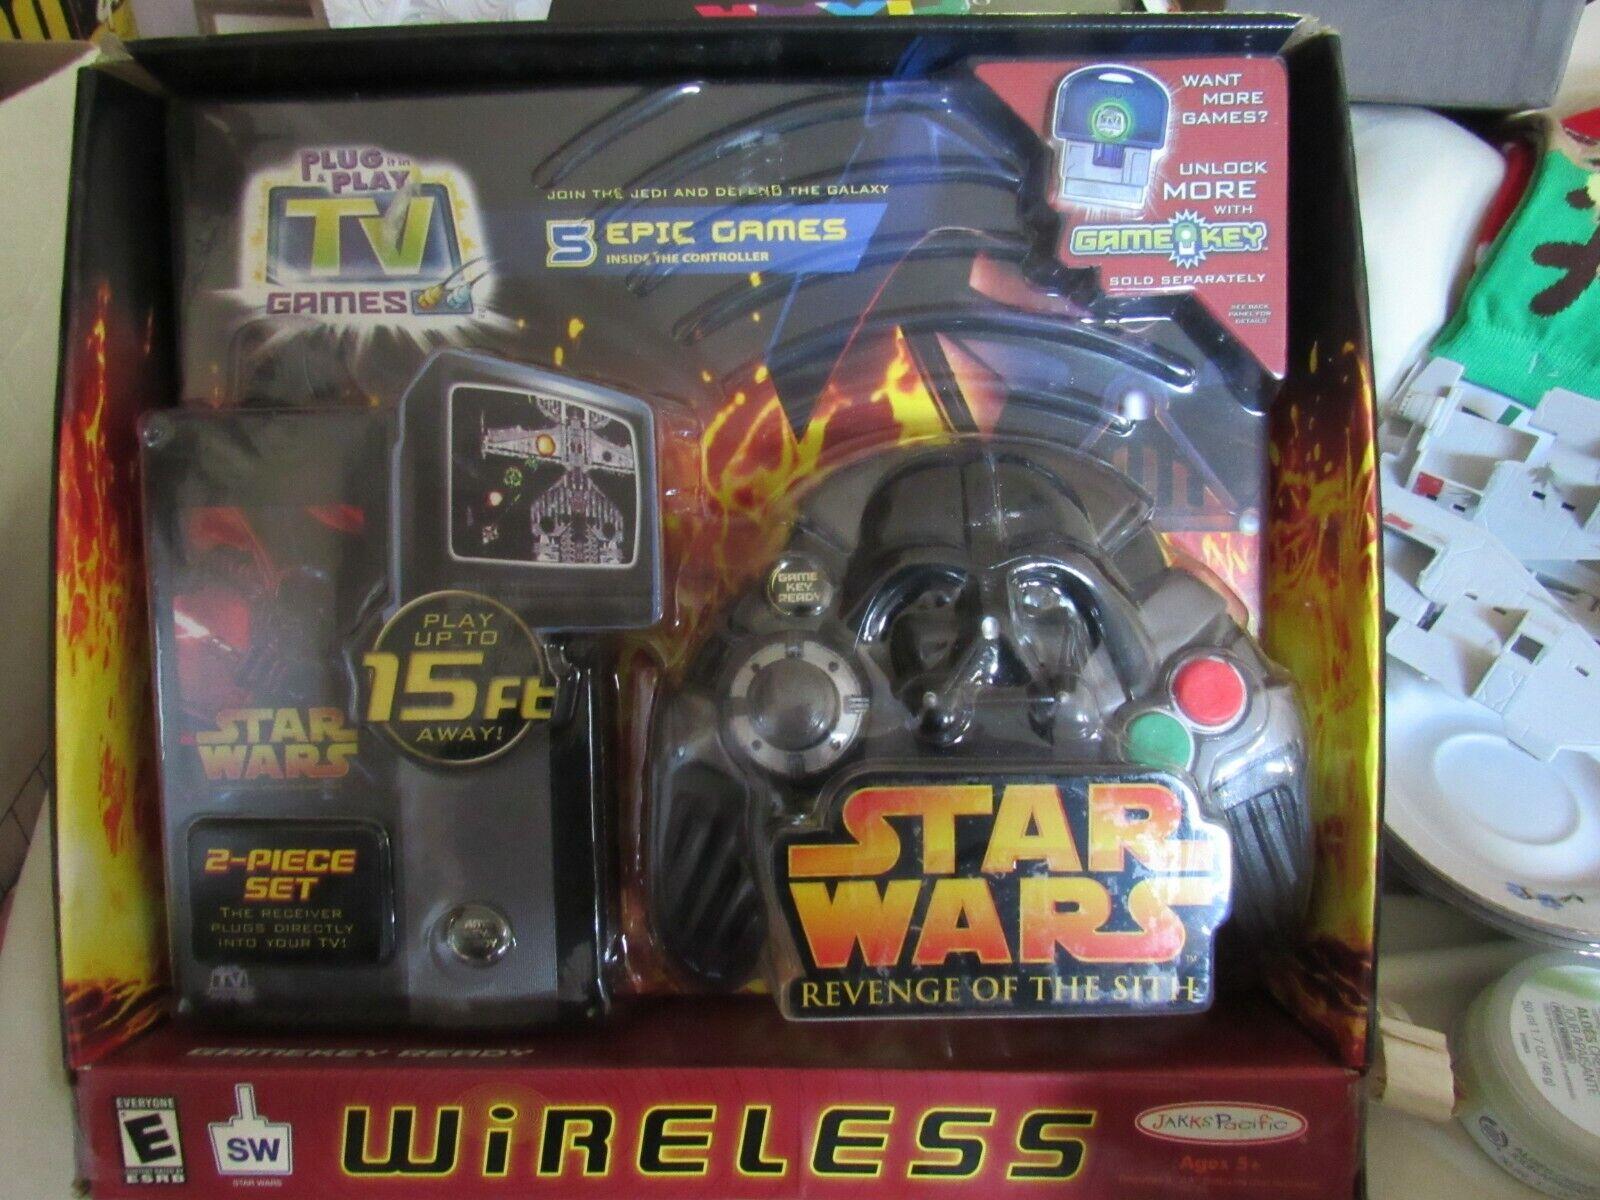 Star Wars Revenge of Sith Wireless Plug /& Play TV Games 2005 Jakks Pacific for sale online